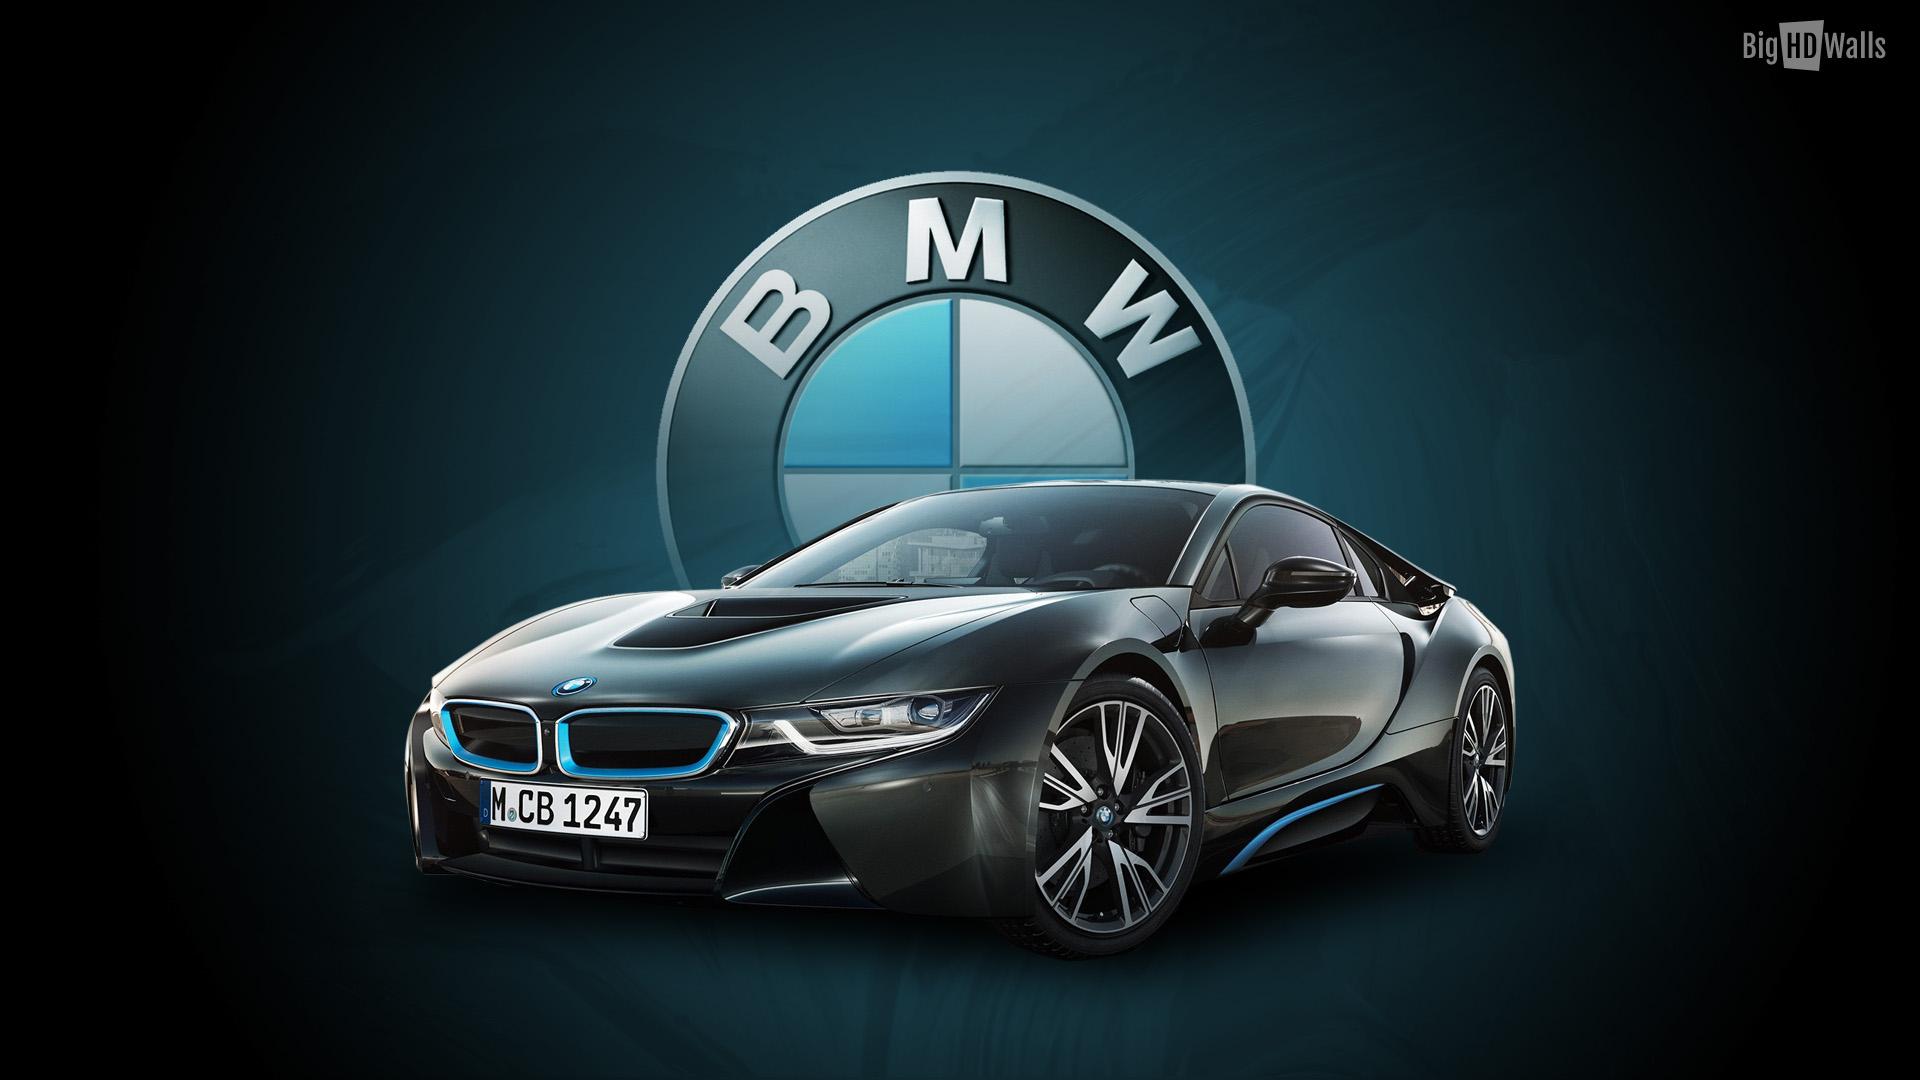 Bmw I8 Cool Car Hd Desktop Wallpapers 4k Hd